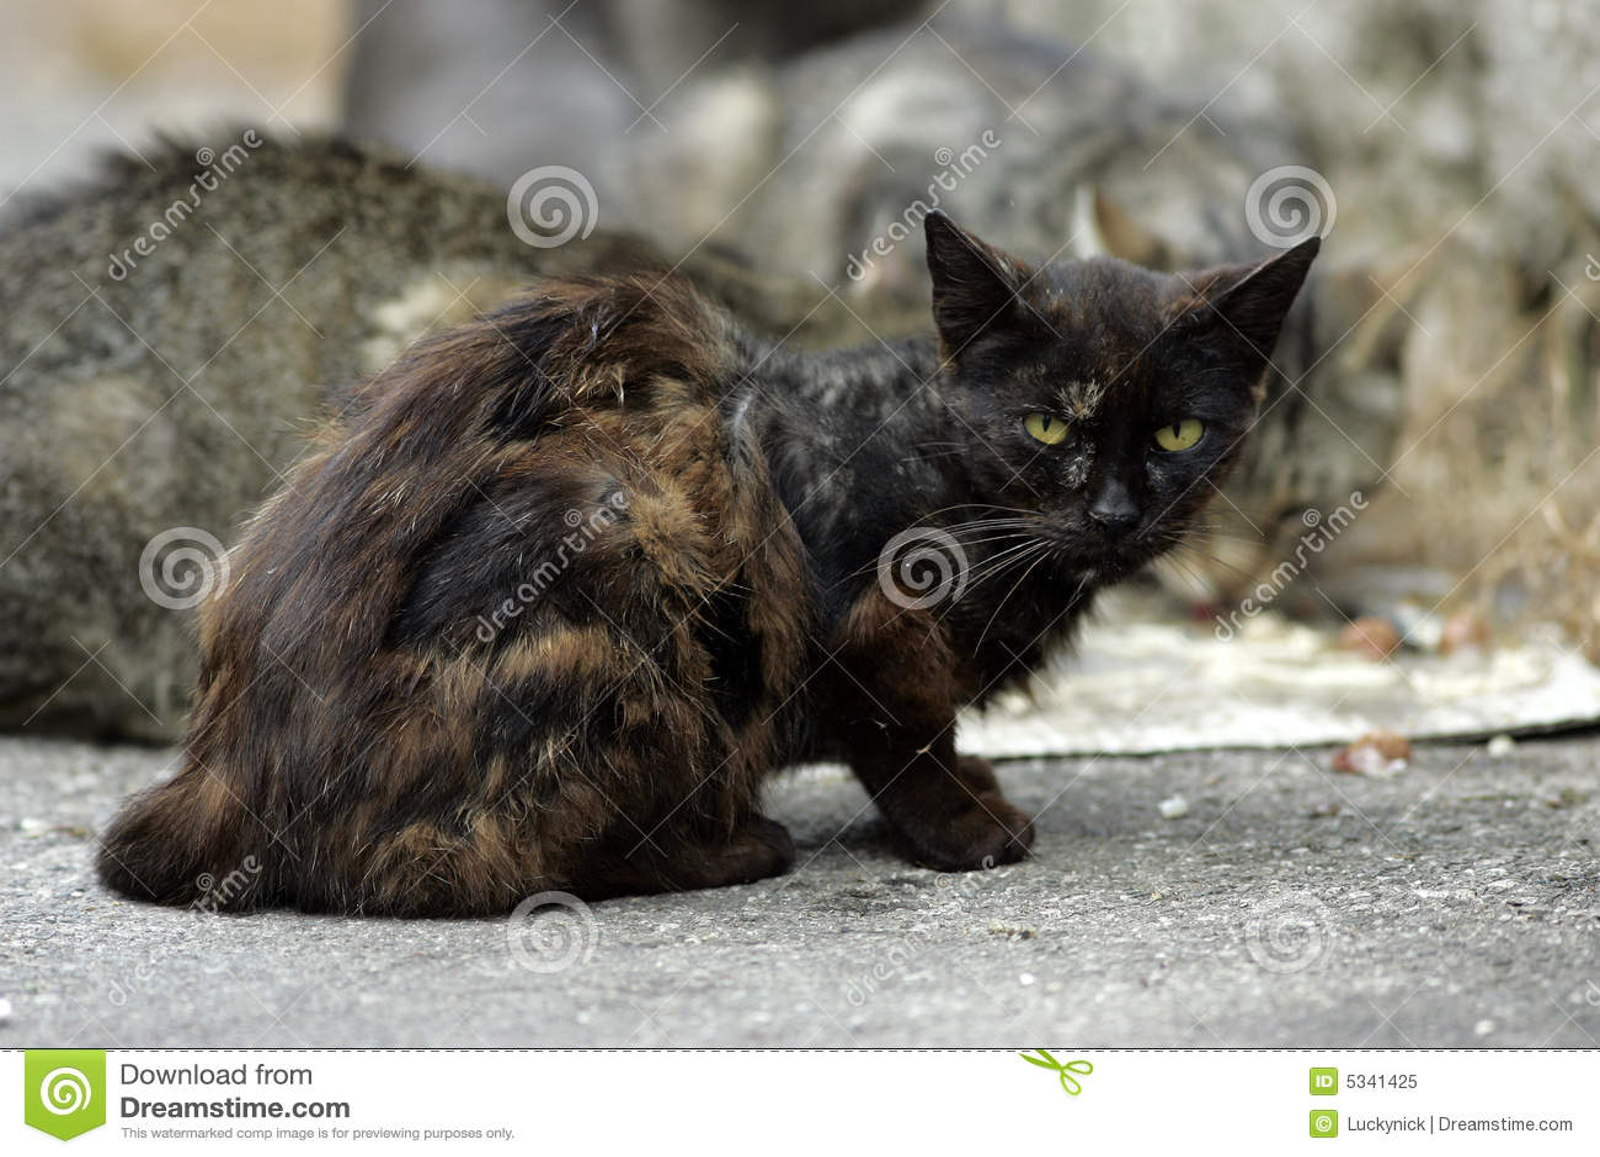 Homeless Cats Royalty Free Stock Photo  Image 5341425